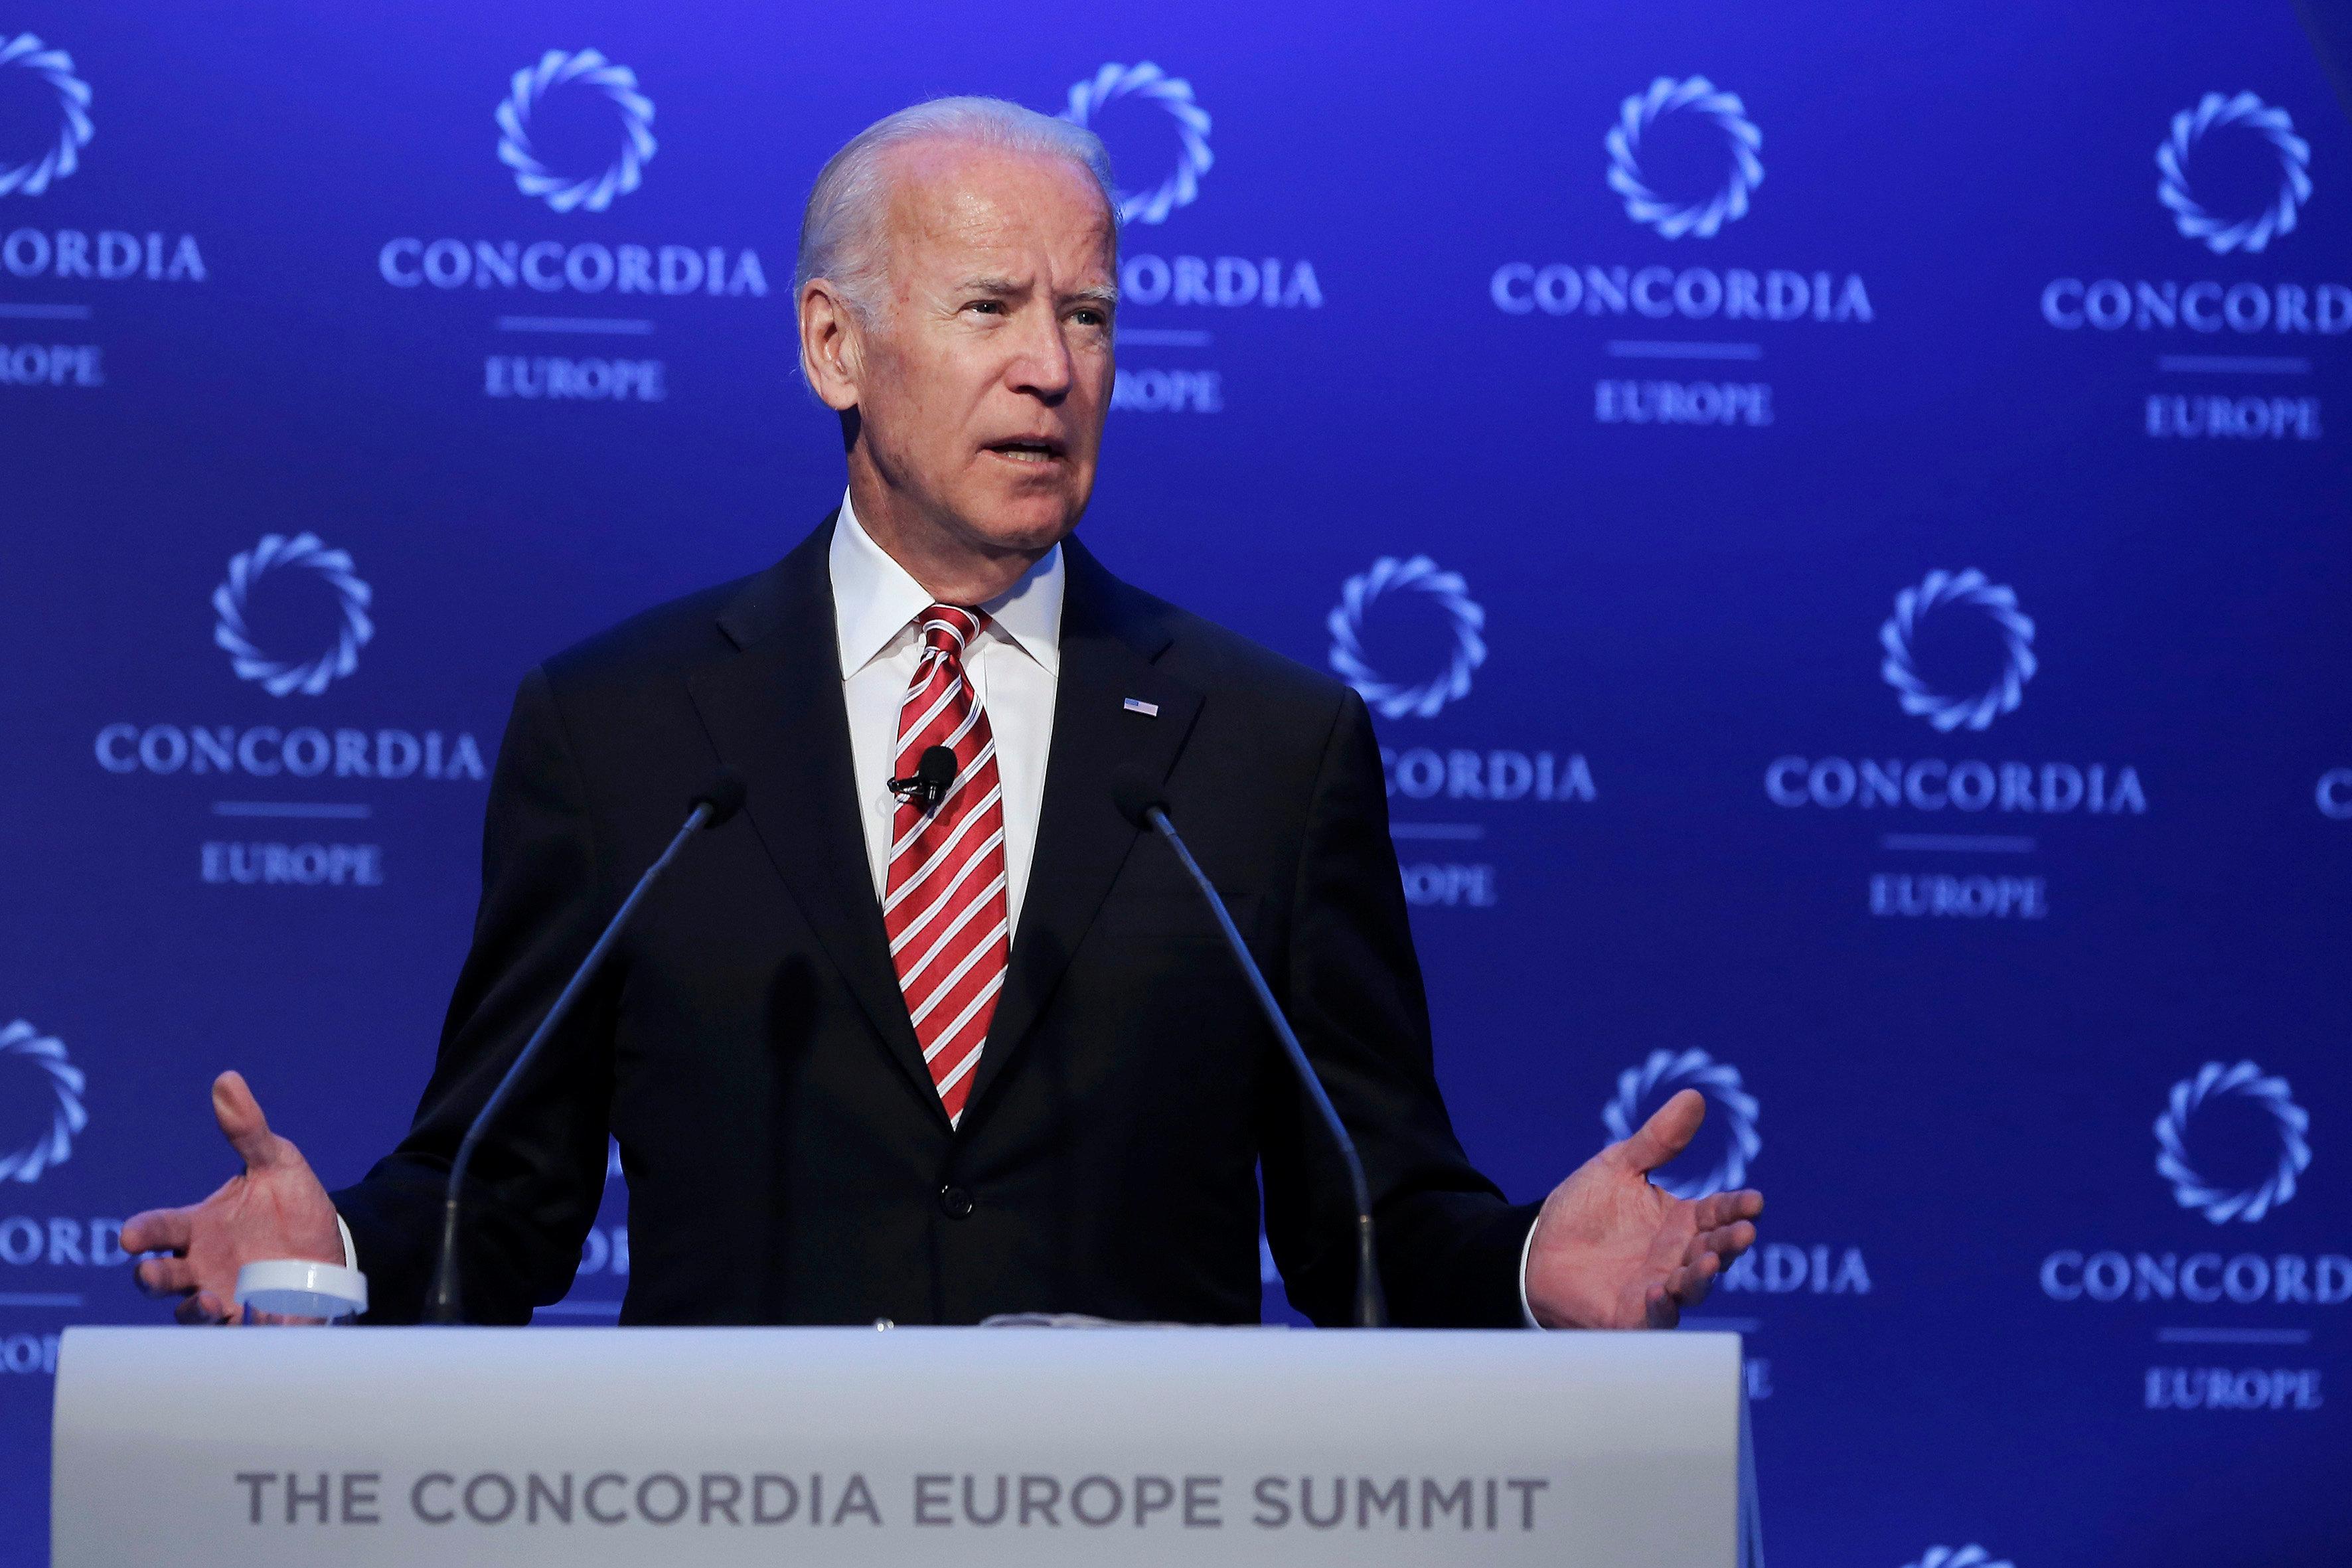 U.S. former Vice President Joe Biden delivers a speech during the Concordia Europe Summit in Athens, Greece June 7, 2017. REUTERS/Costas Baltas